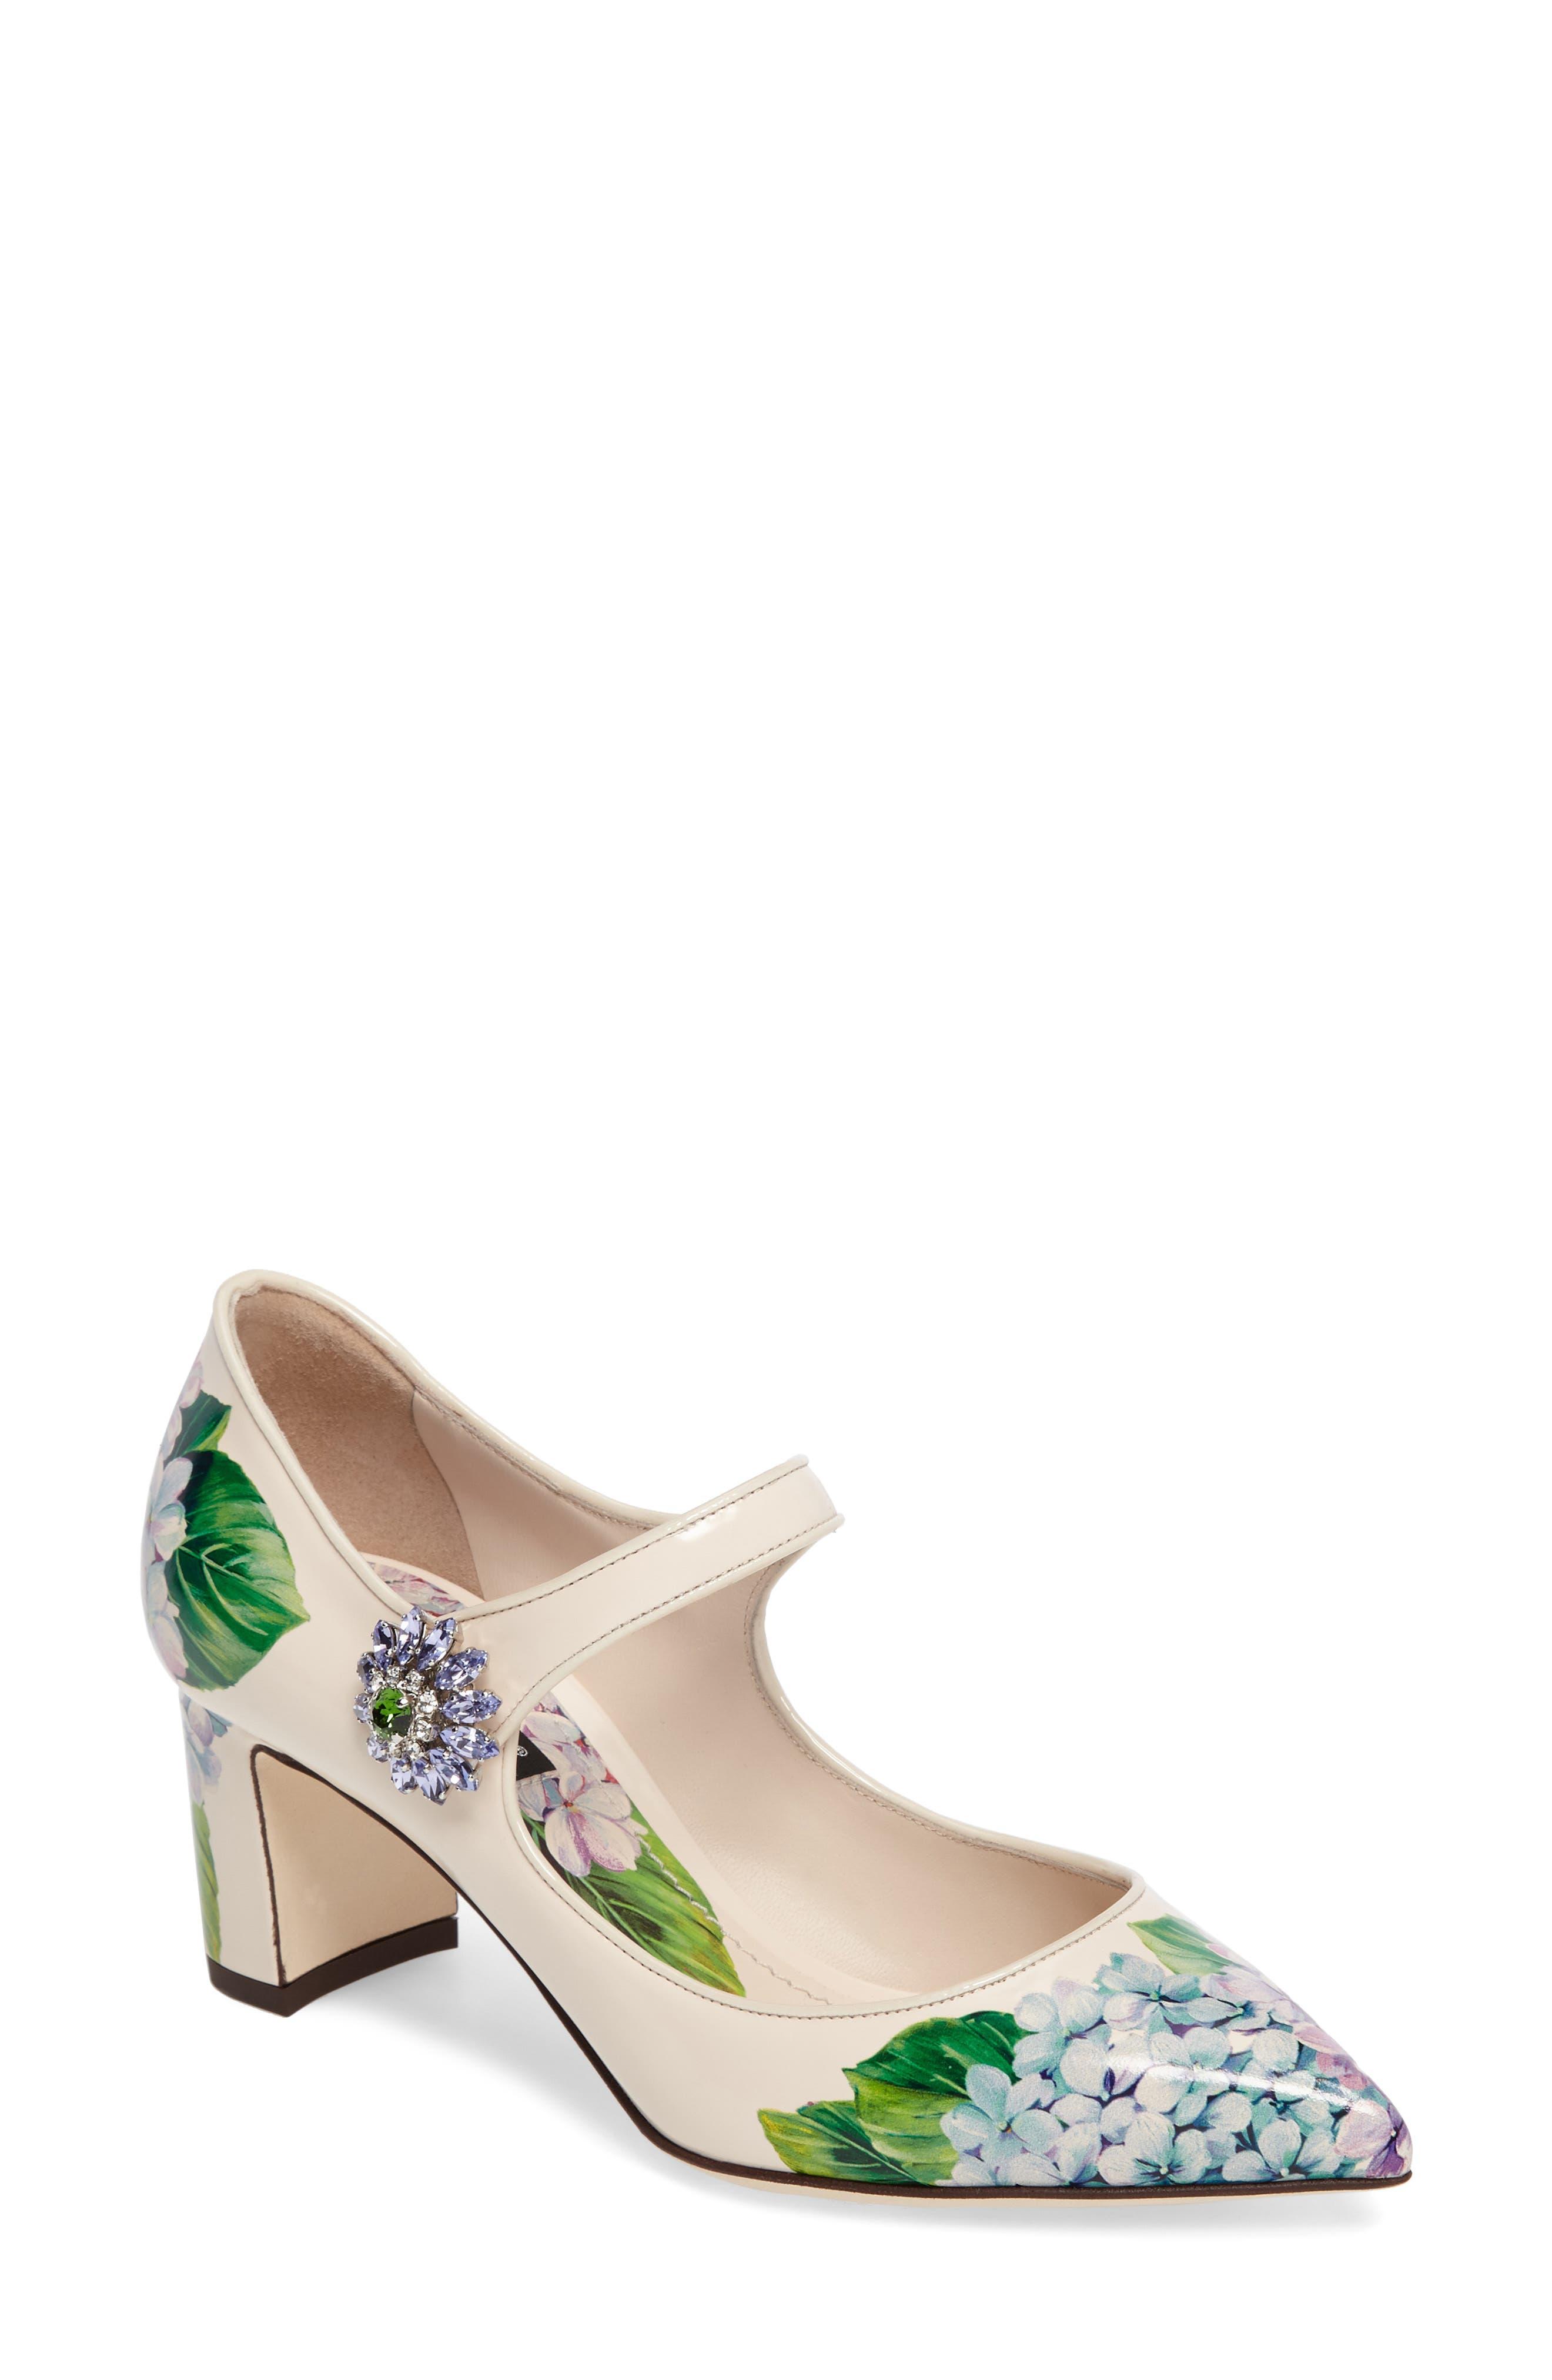 Dolce&Gabbana Hydrangea Mary Jane Pump (Women)